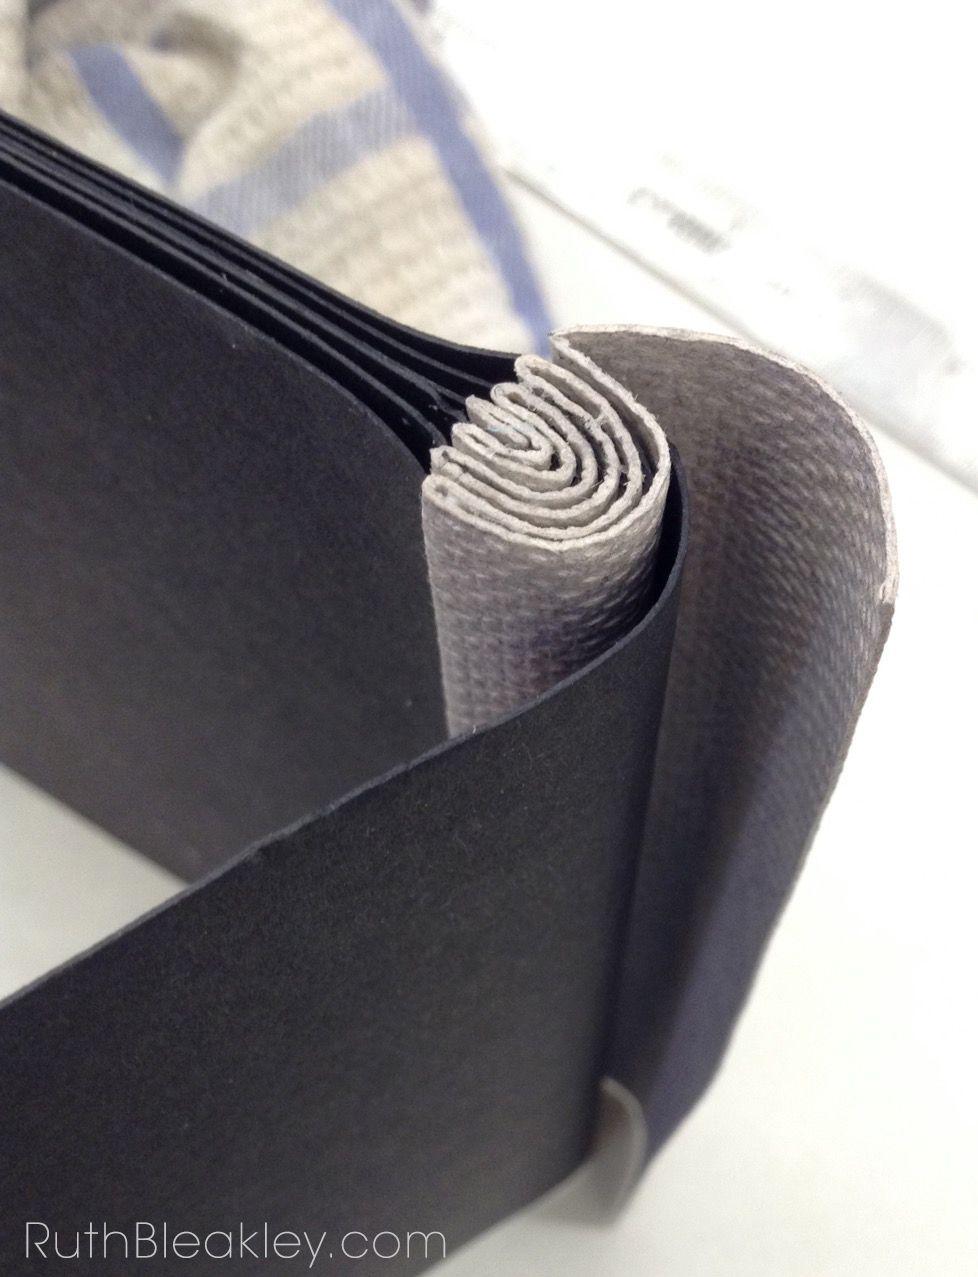 benjamin elbel demonstrating onionskin binding at penland. Black Bedroom Furniture Sets. Home Design Ideas